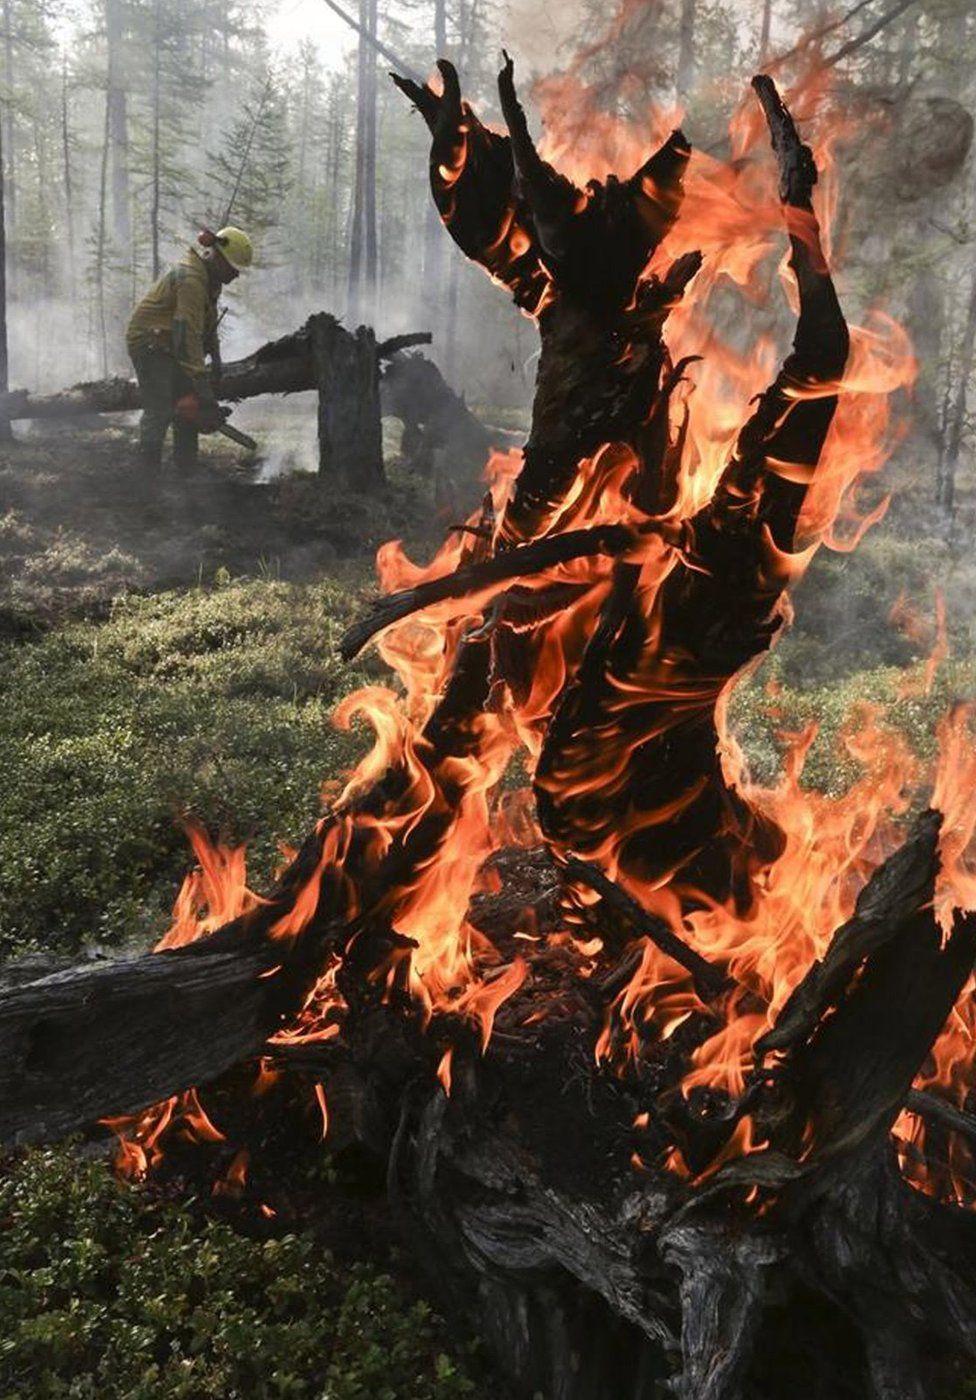 A burning tree in Krasnoyarsk region, Russia. Photo: 1 August 2019